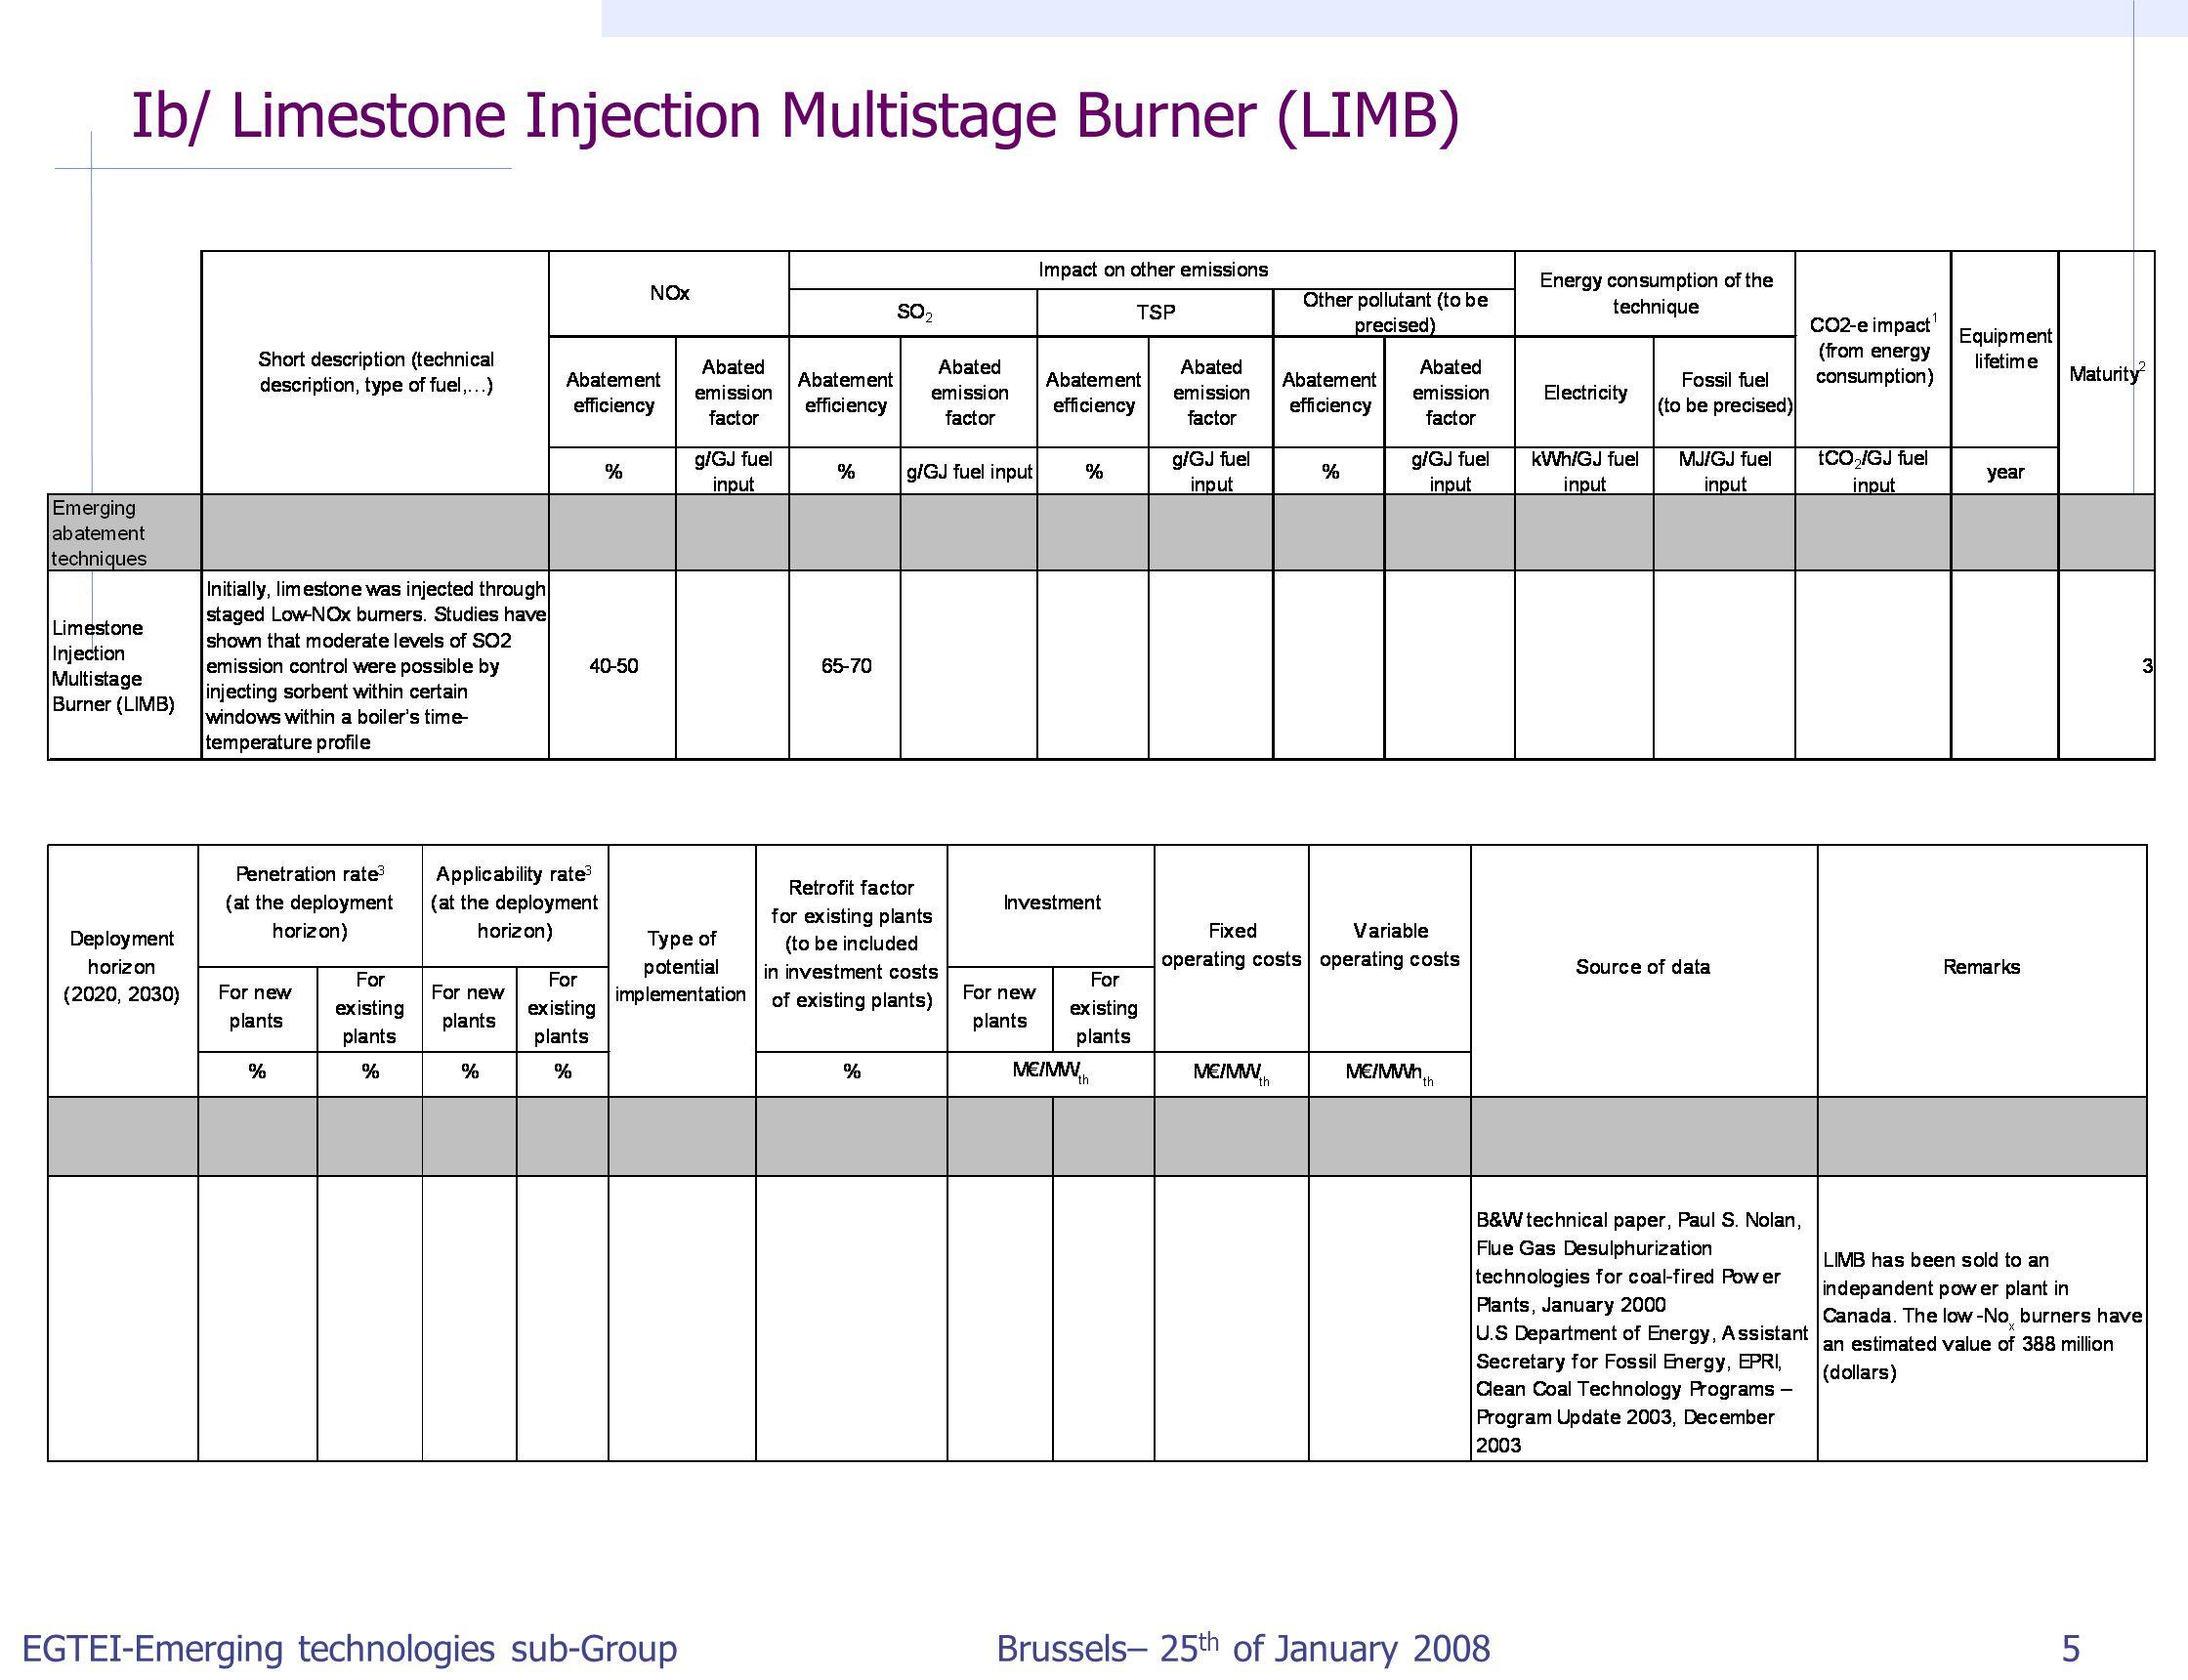 EGTEI-Emerging technologies sub-Group Brussels– 25 th of January 2008 5 Ib/ Limestone Injection Multistage Burner (LIMB)